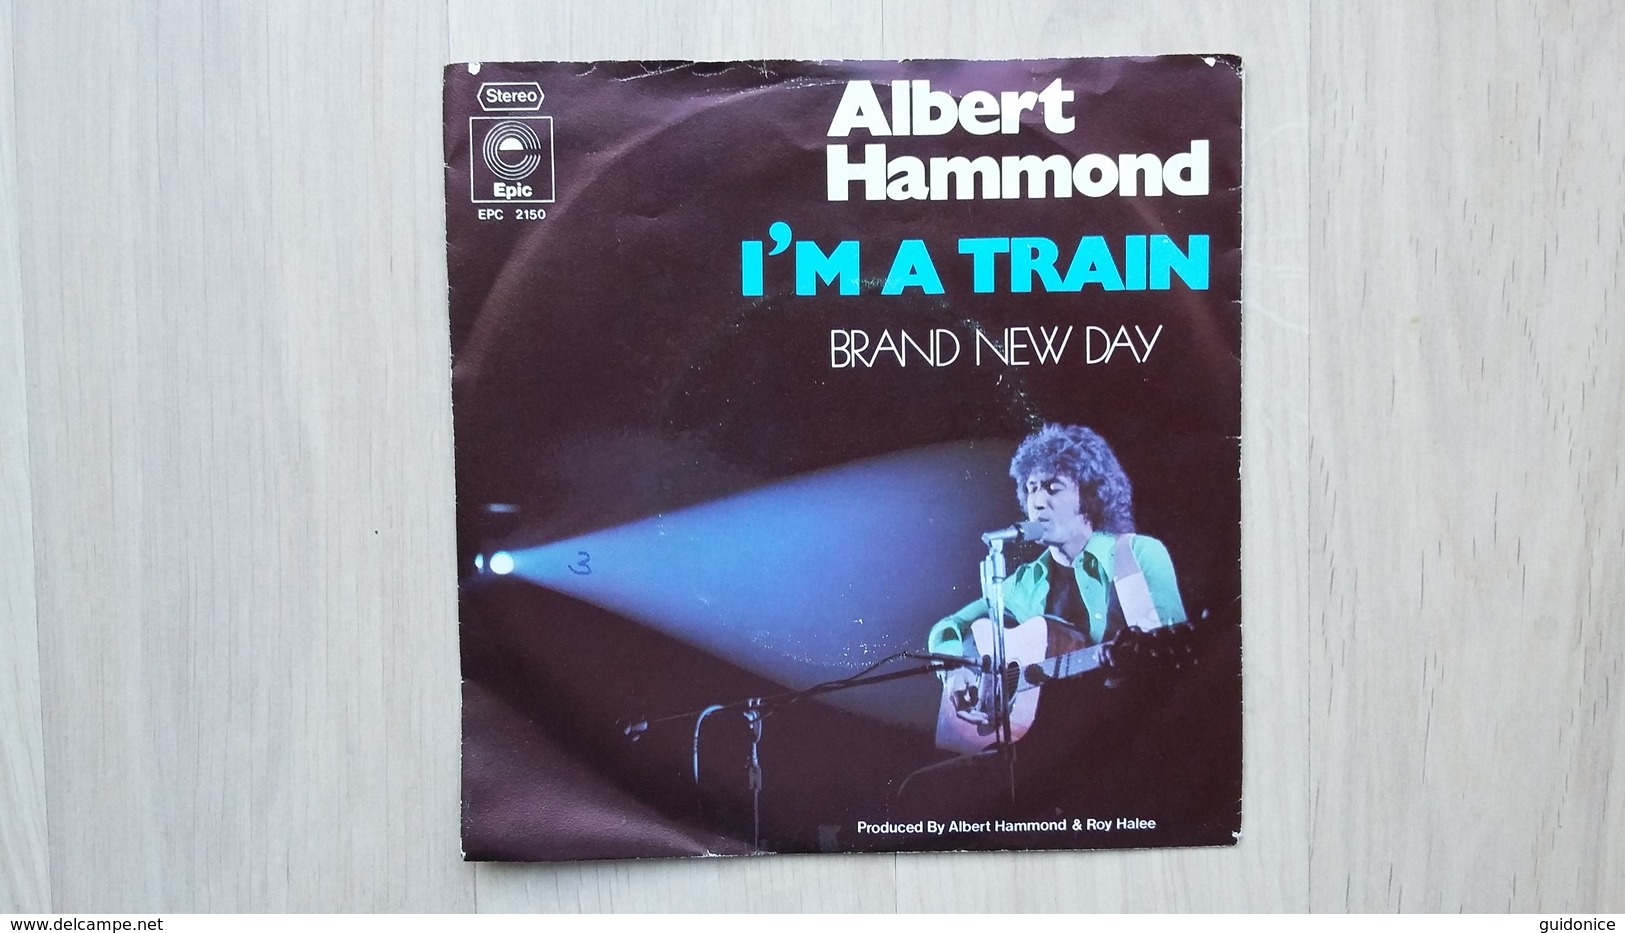 Albert Hammond - I'm A Train - Vinyl-Single - Country & Folk